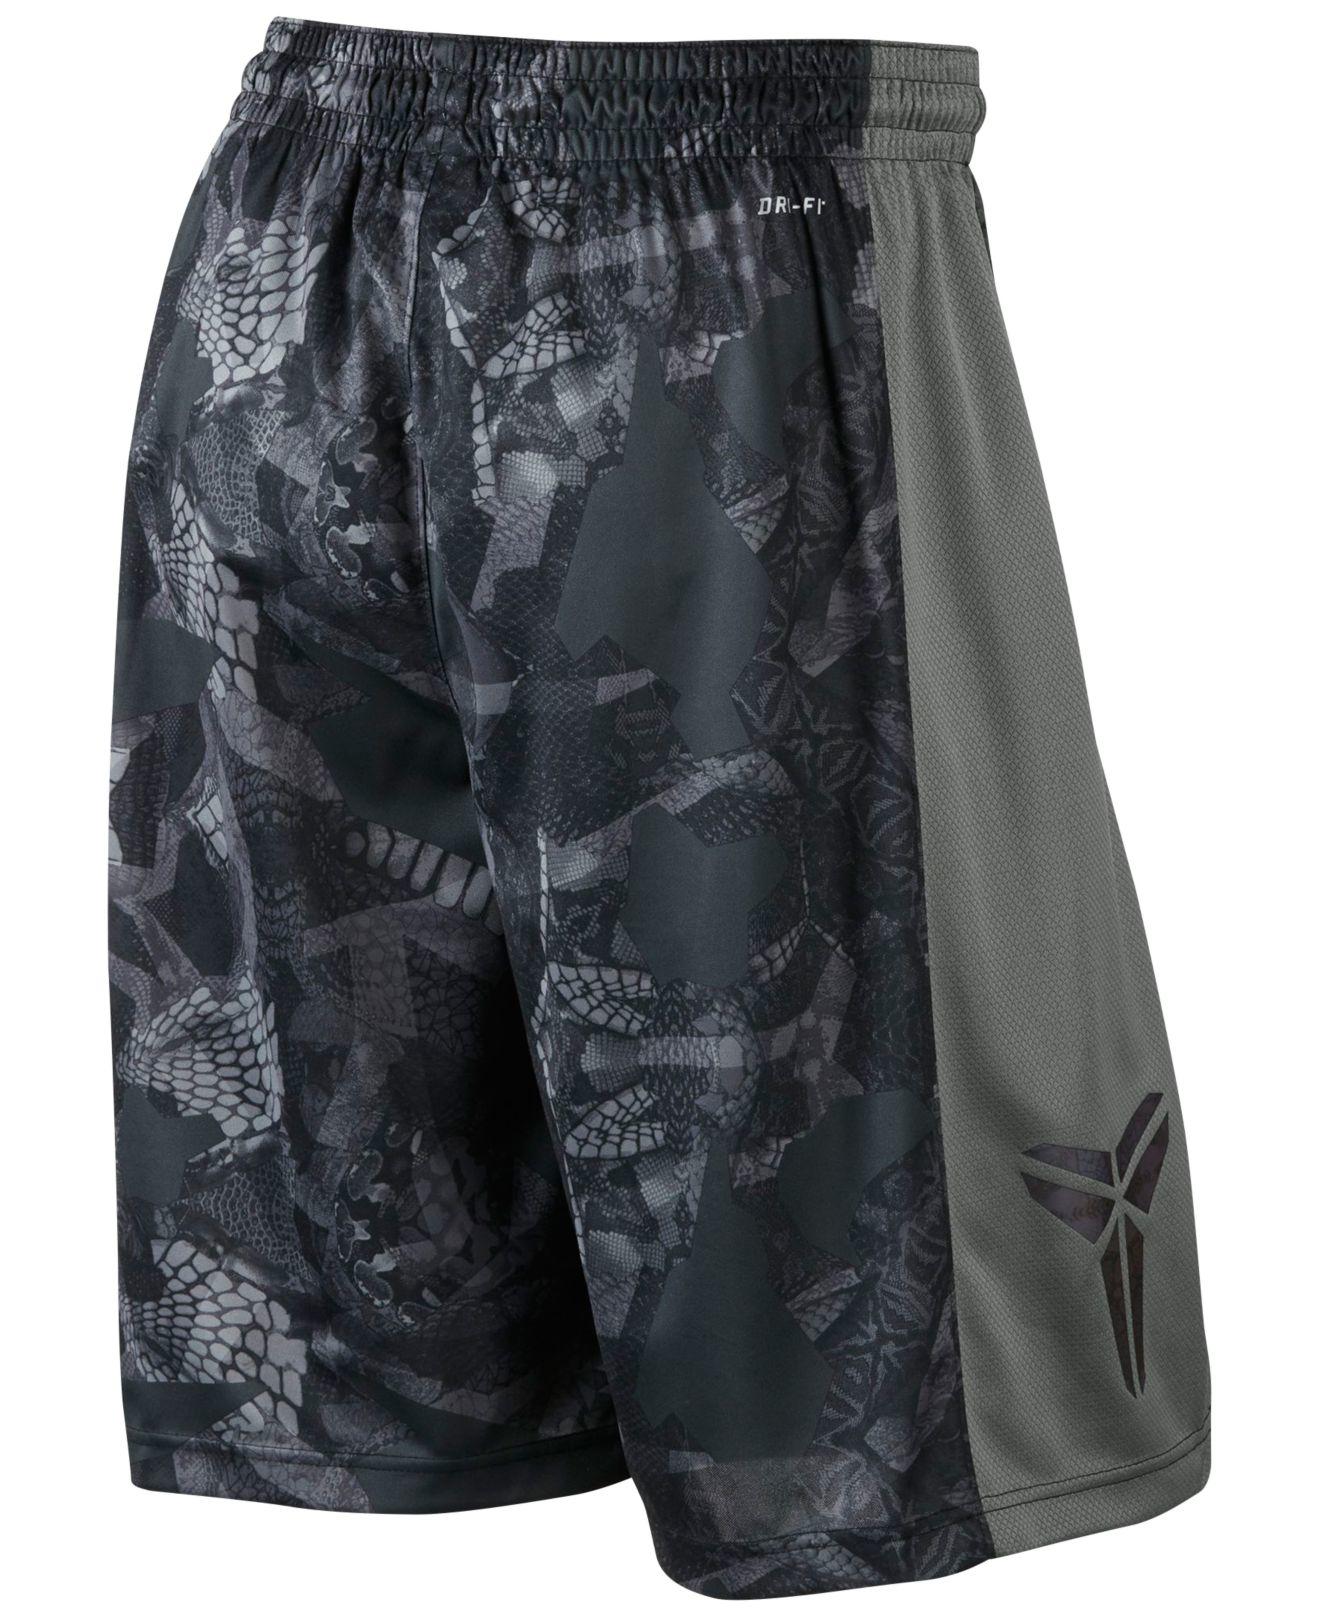 nike kobe shorts 50% off 5f6ba 02811